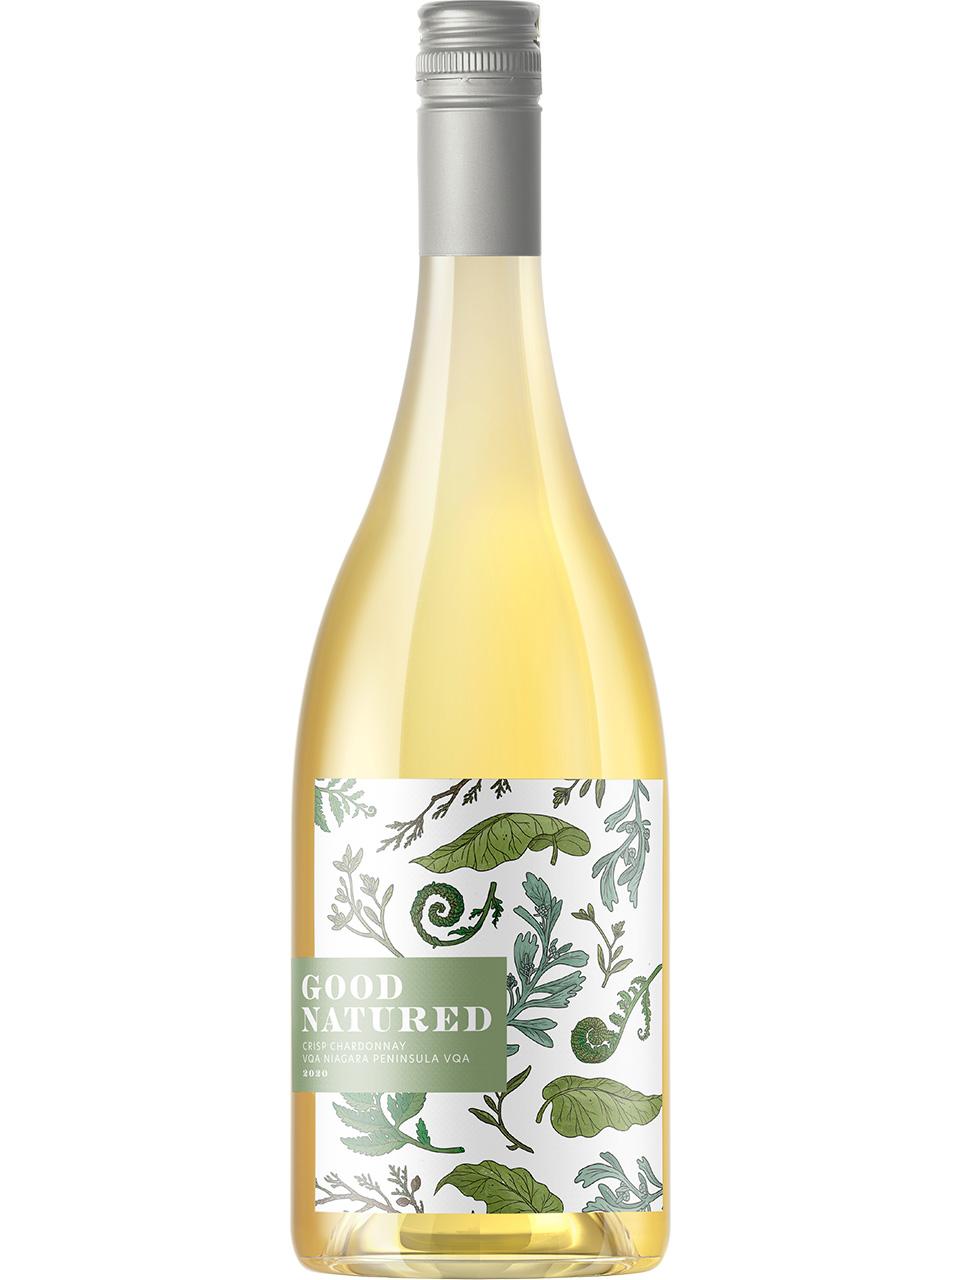 Good Natured Crisp Chardonnay VQA